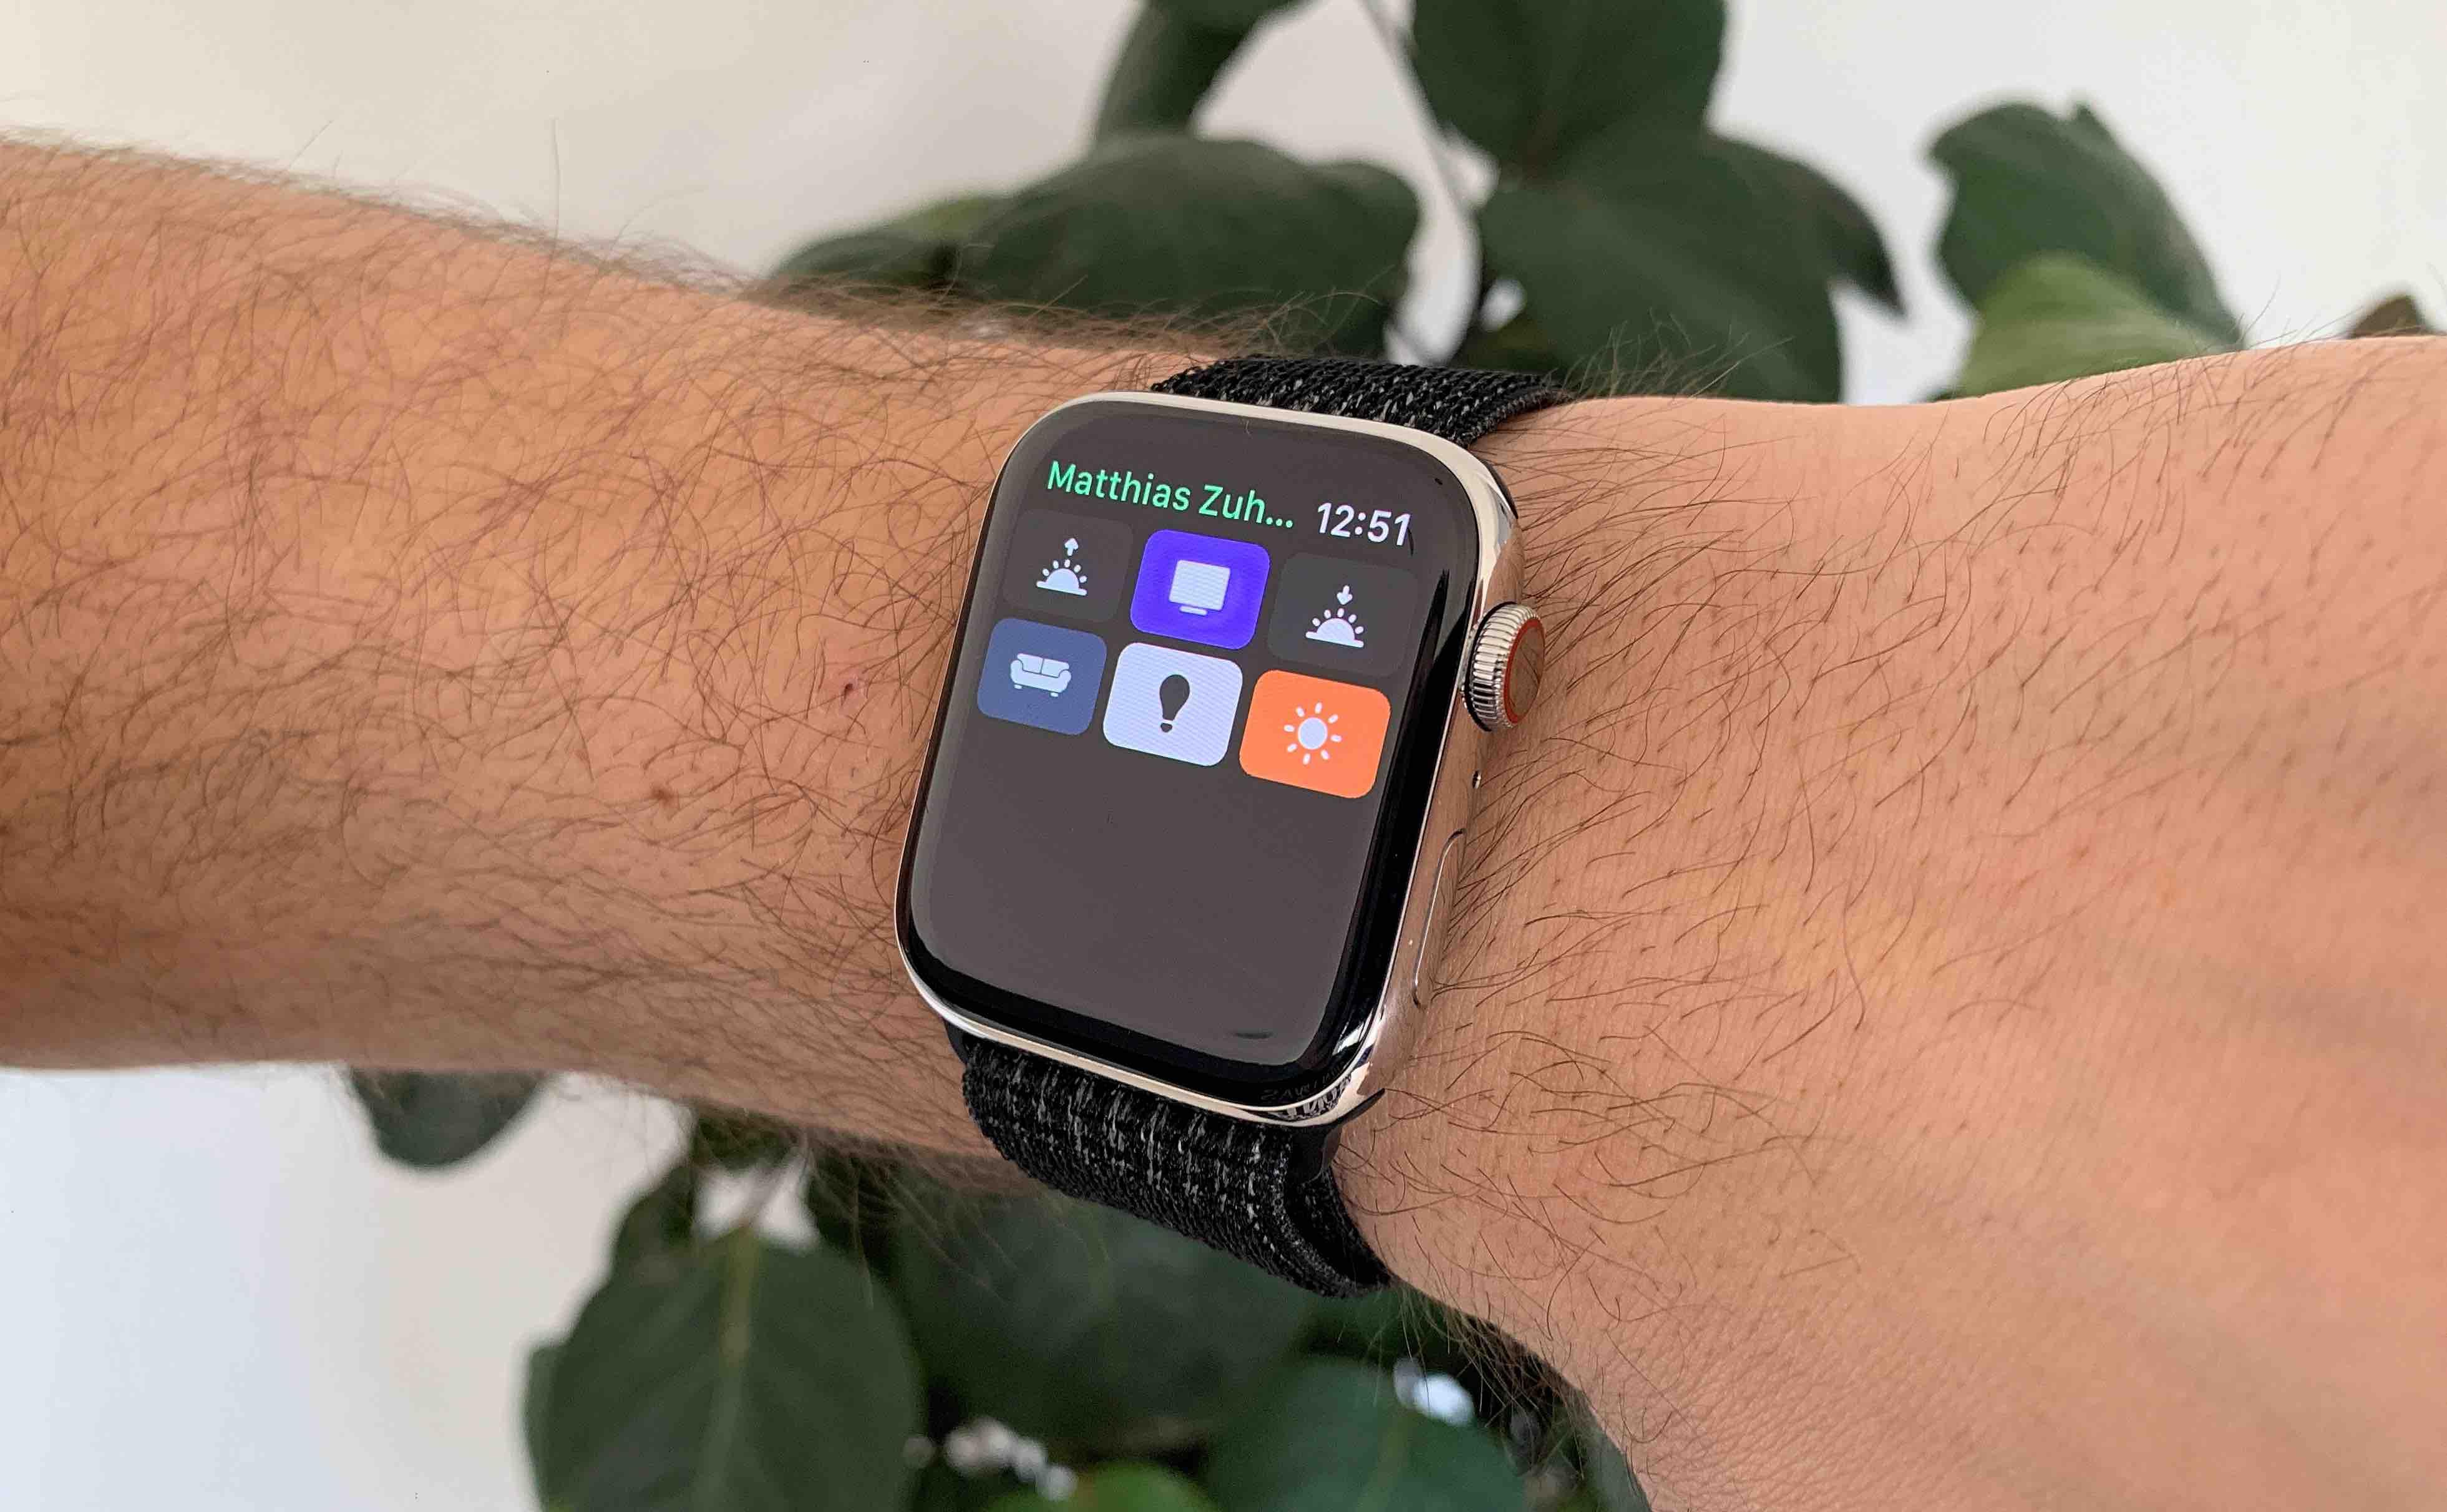 HomeRun_Apple_Watch_HomeKit-Review02 HomeRun - schalte HomeKit-Szenen auf der Apple Watch über Schaltflächen